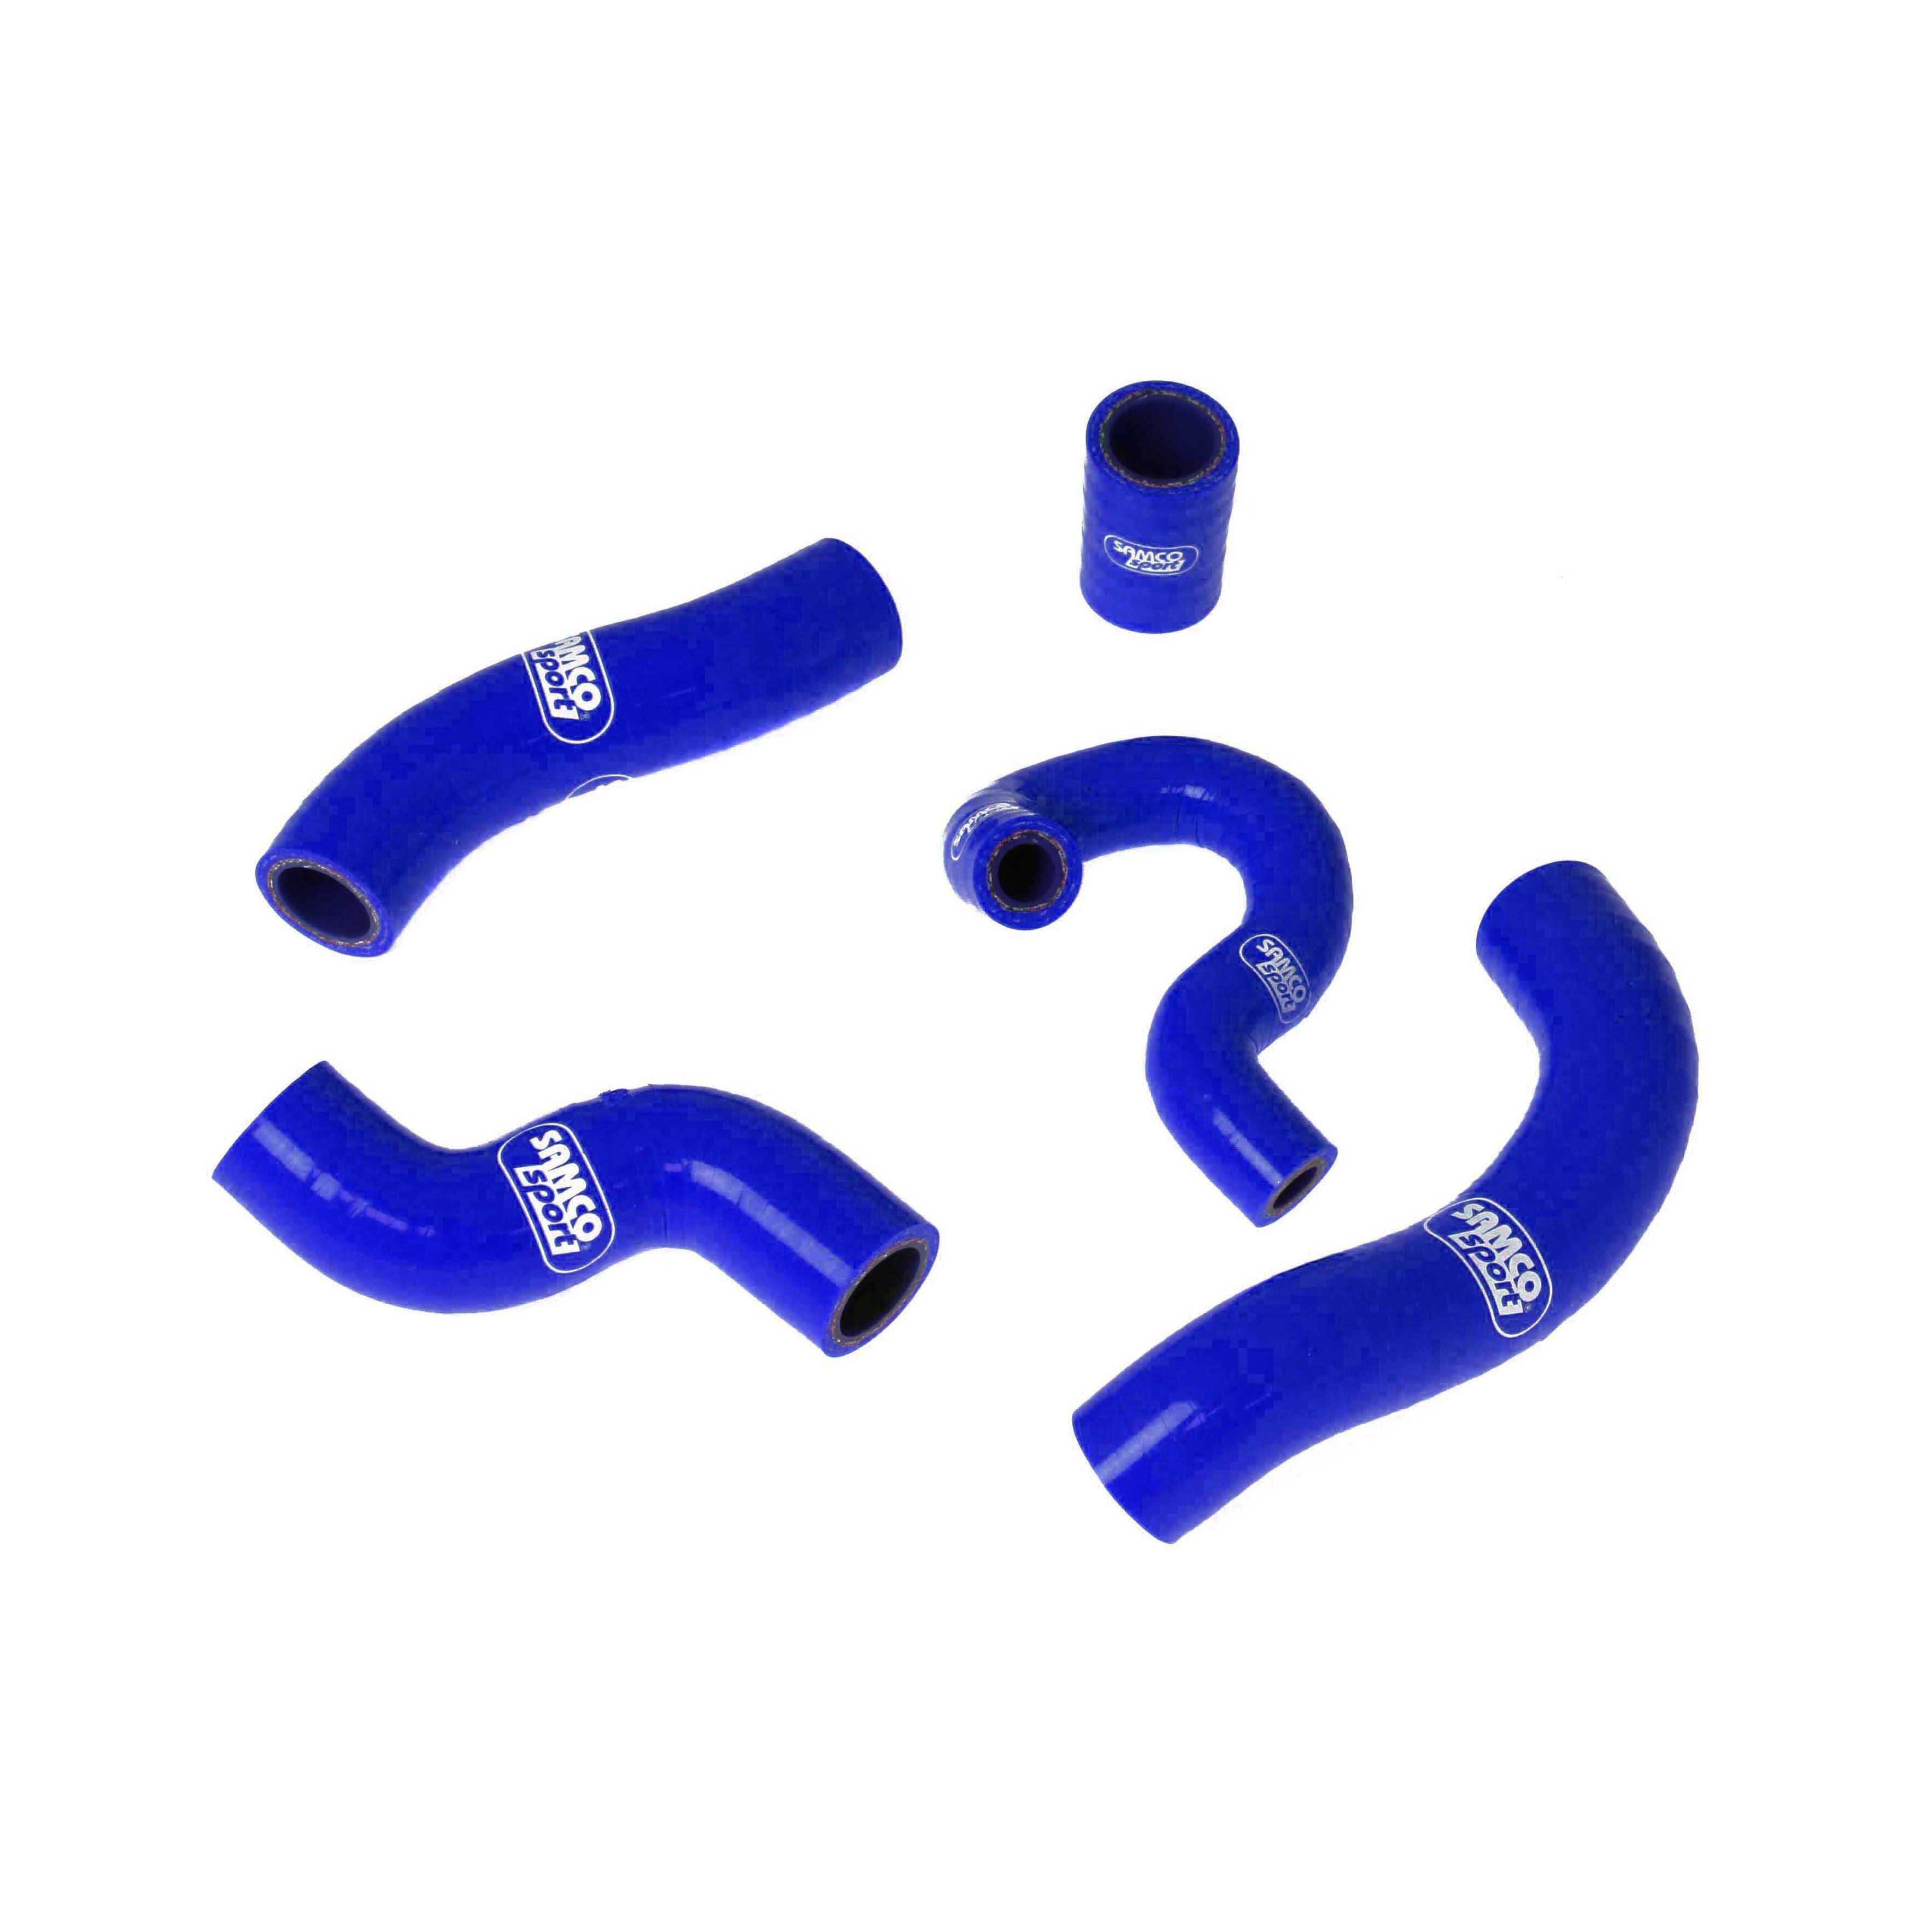 Siliconschlauch Kit blau Husaberg FE450, FE501